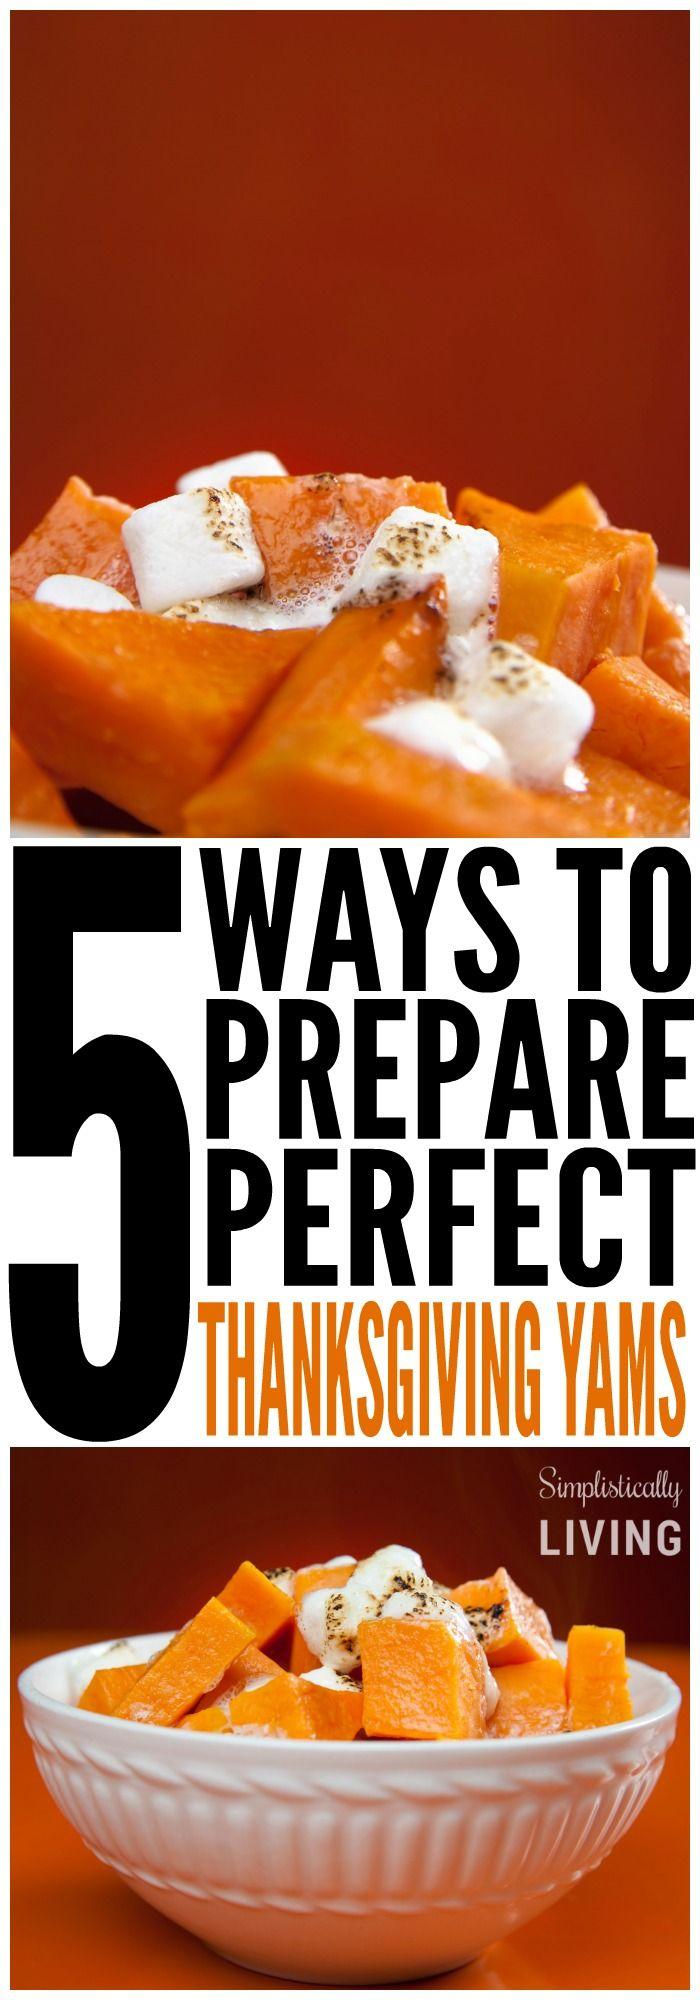 5 Ways to Prepare Perfect Thanksgiving Yams Simplistically Living